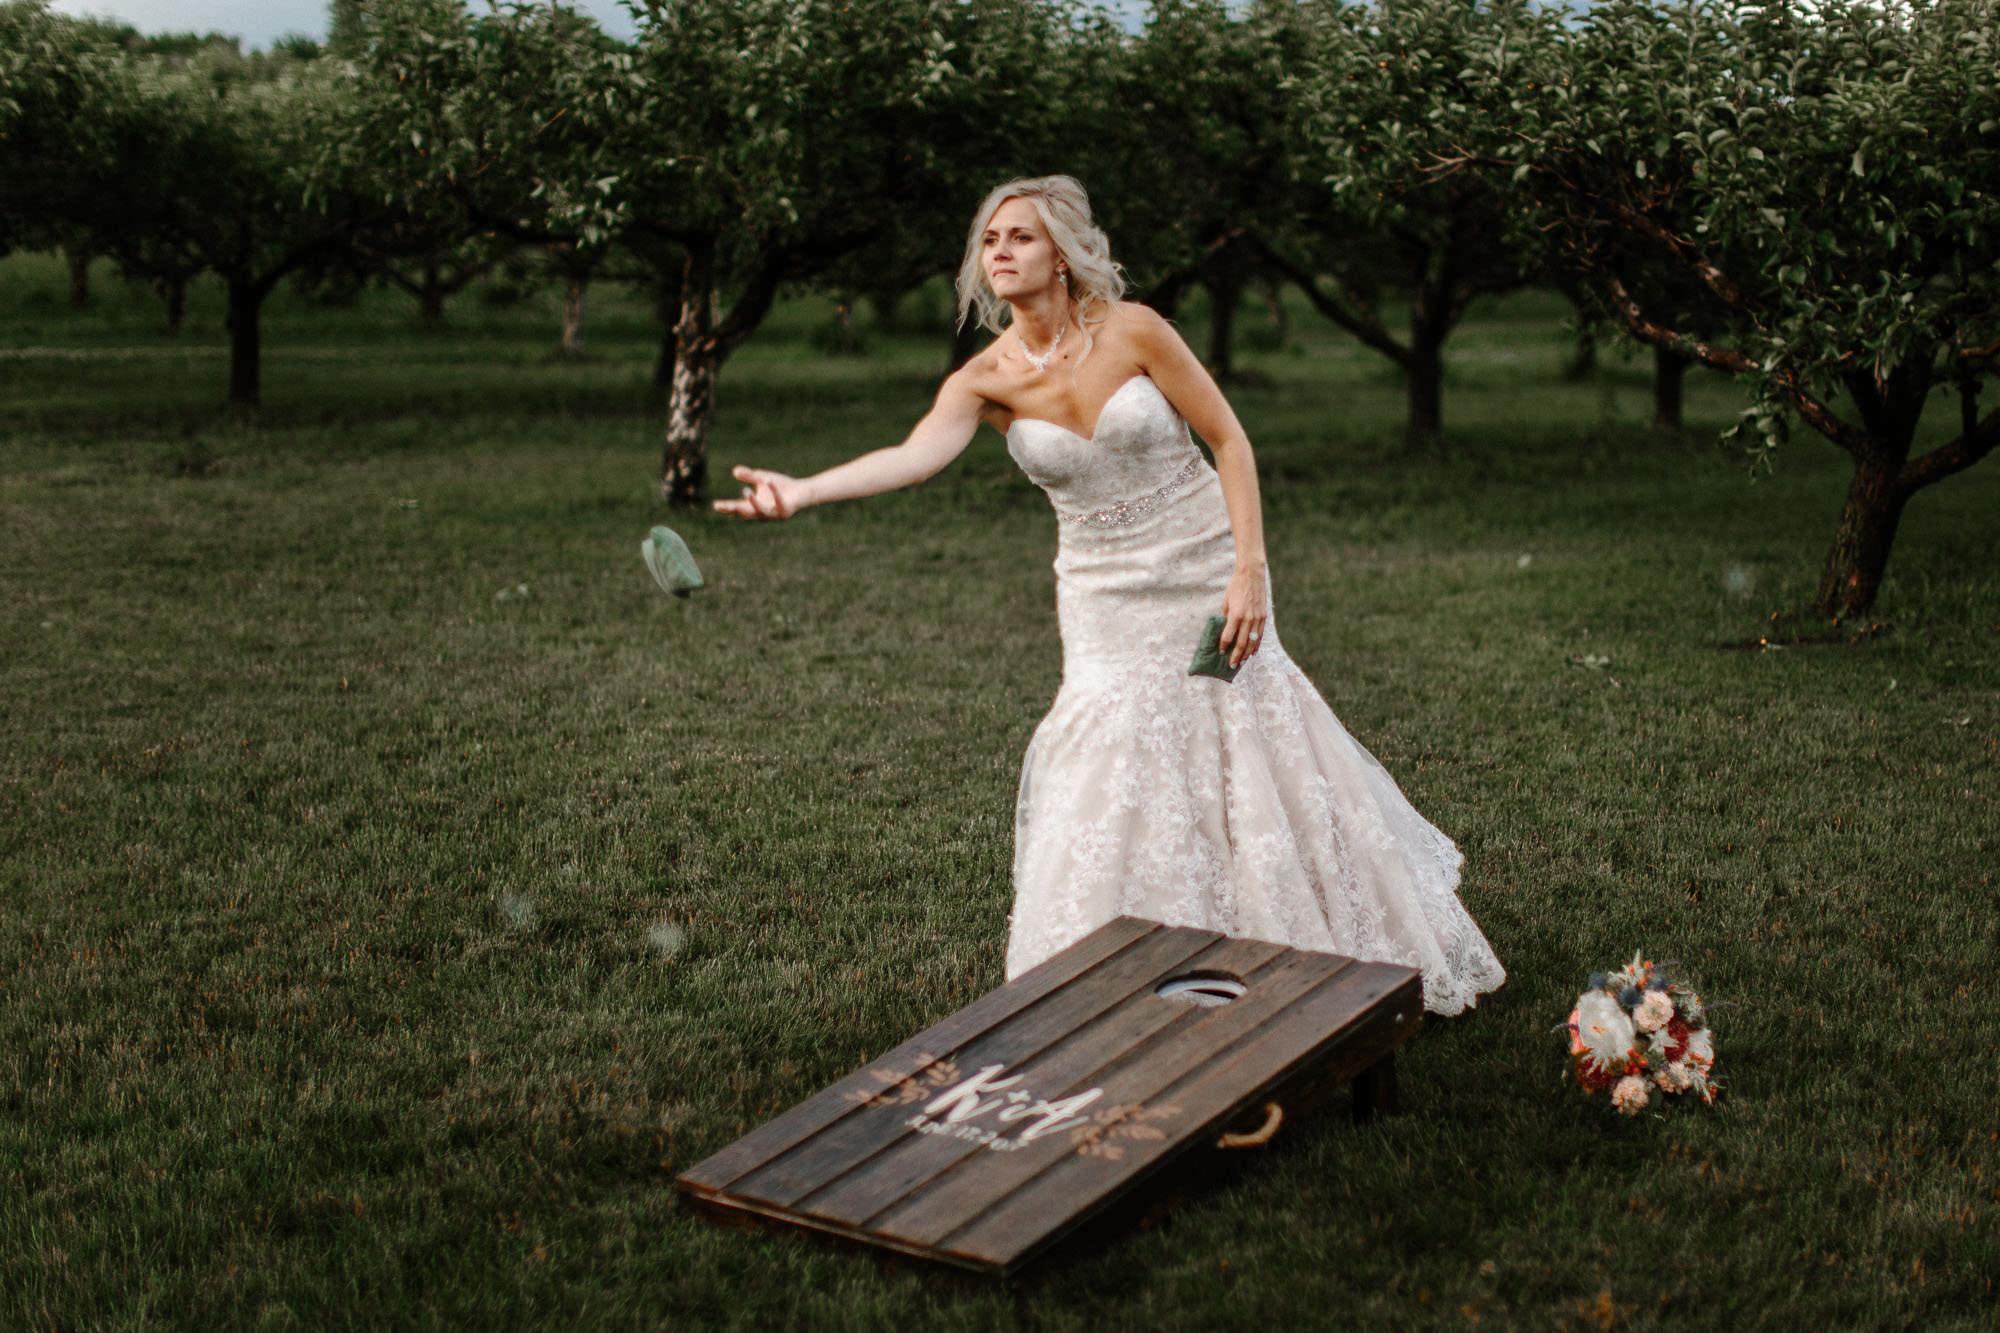 meadow-barn-wedding-sioux-falls-south-dakota-romantic-adventerous-michael-liedtke-photography061.jpg